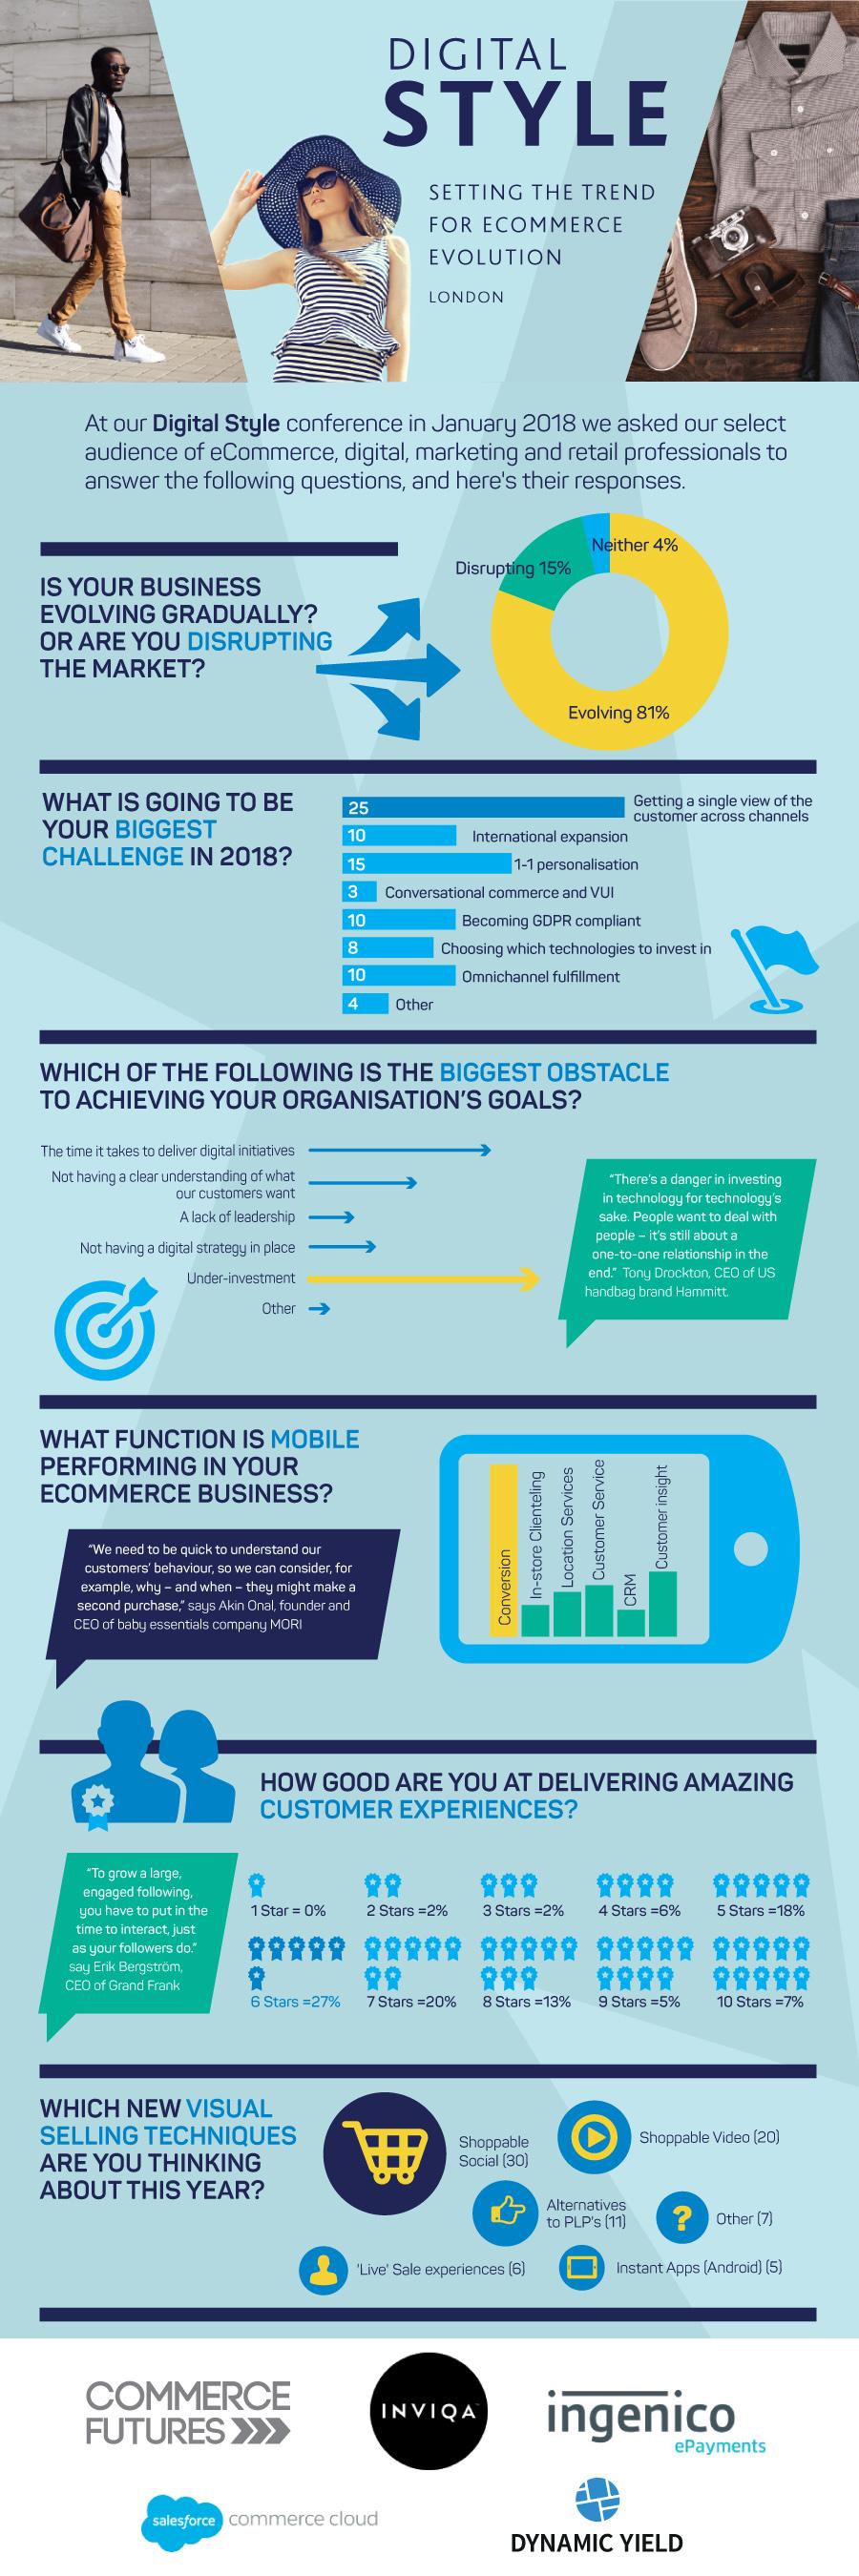 Digital-Style-Infographic-All.jpg